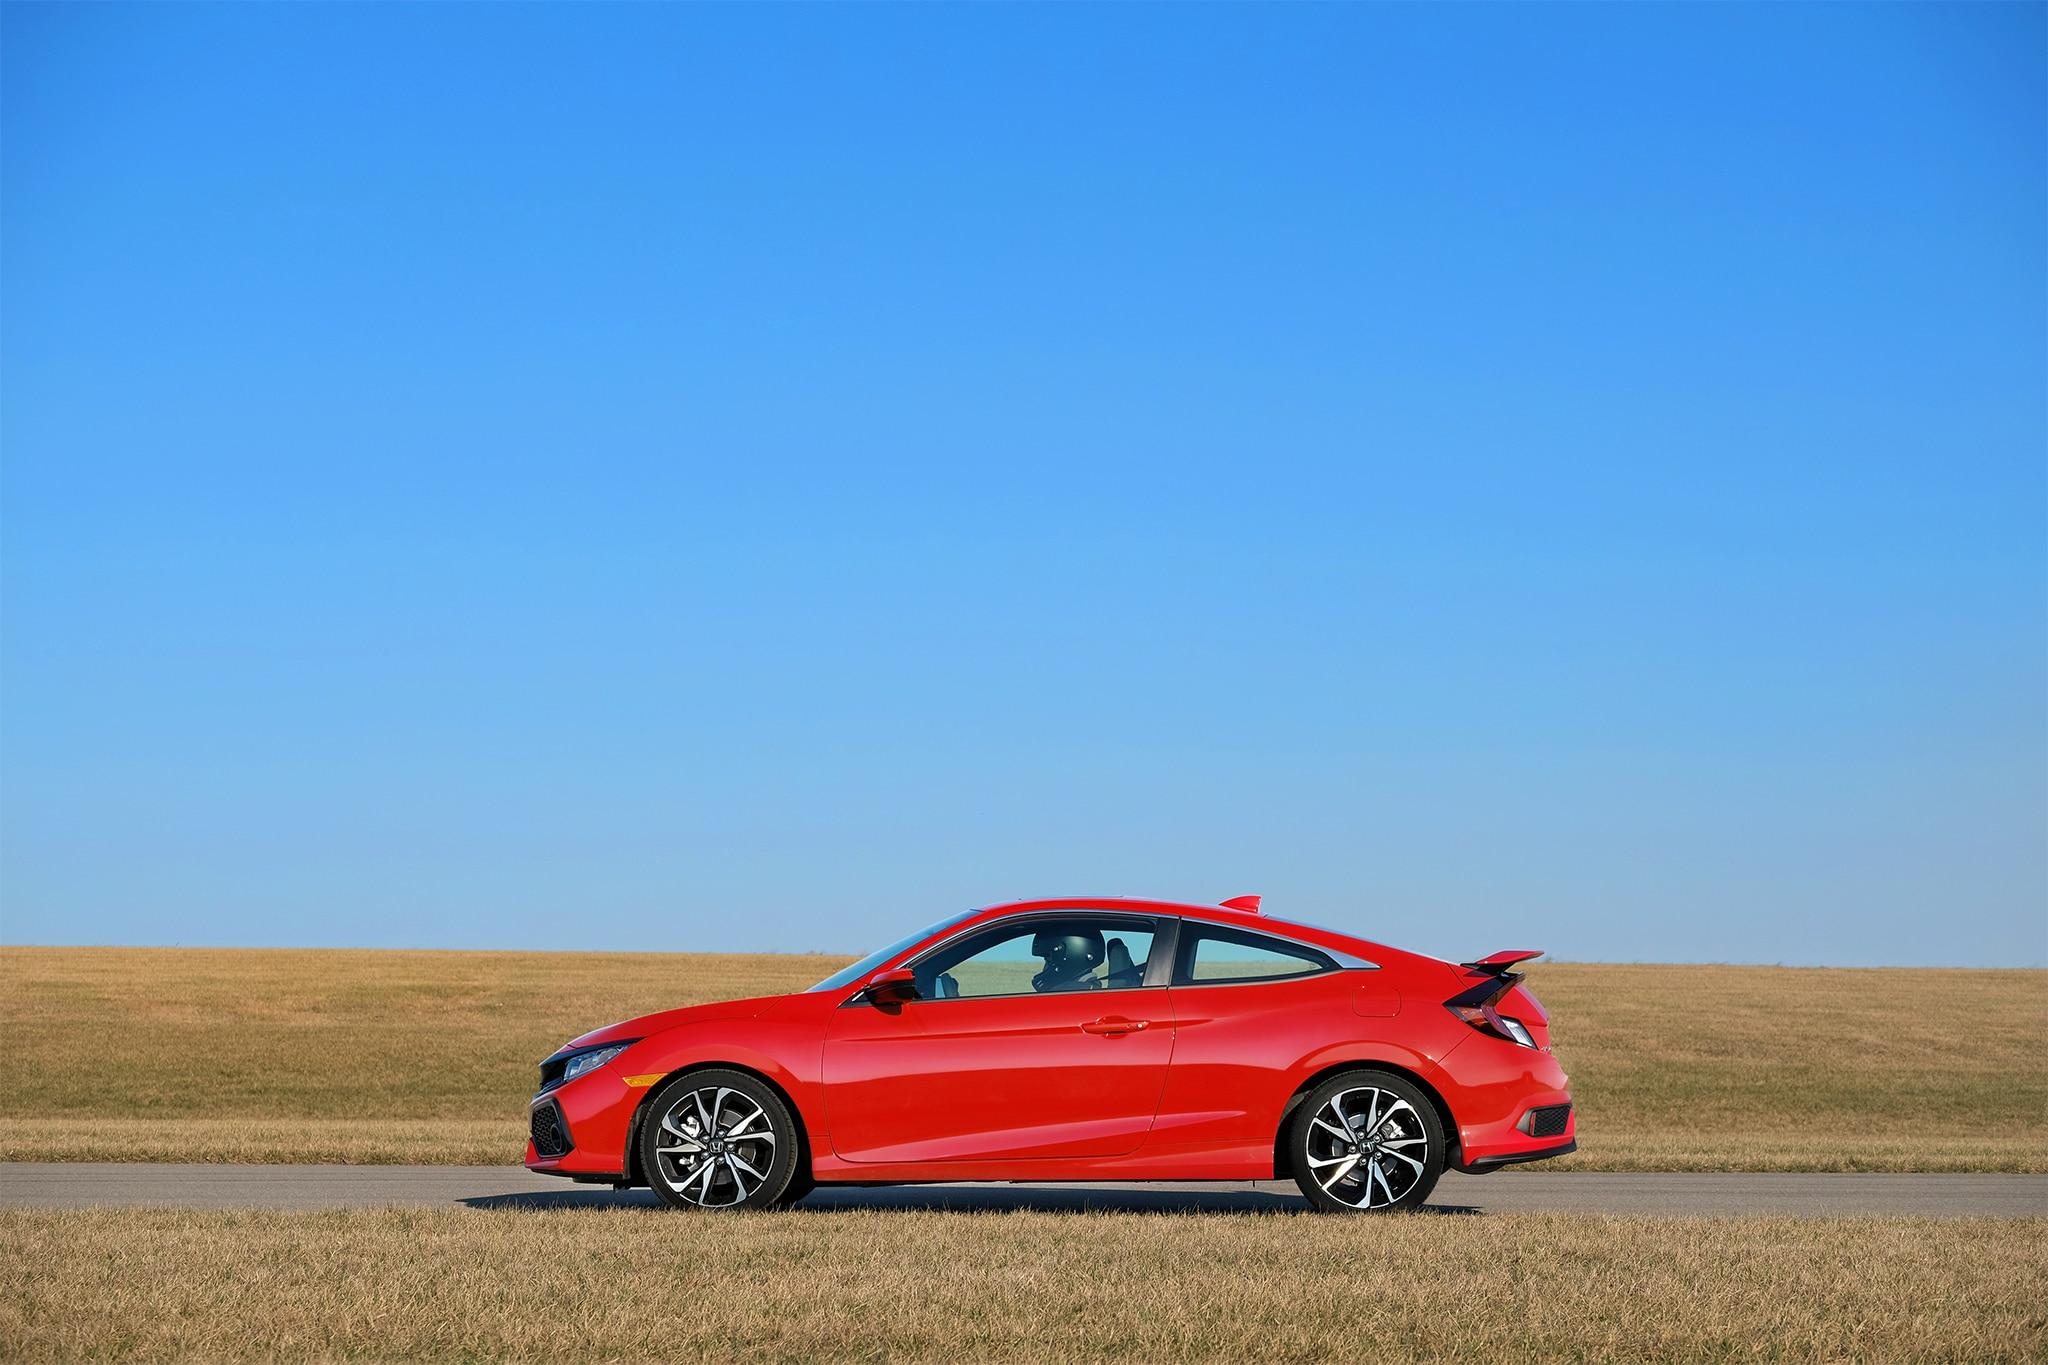 2017 honda civic si coupe quick take review automobile for Honda civic si 0 60